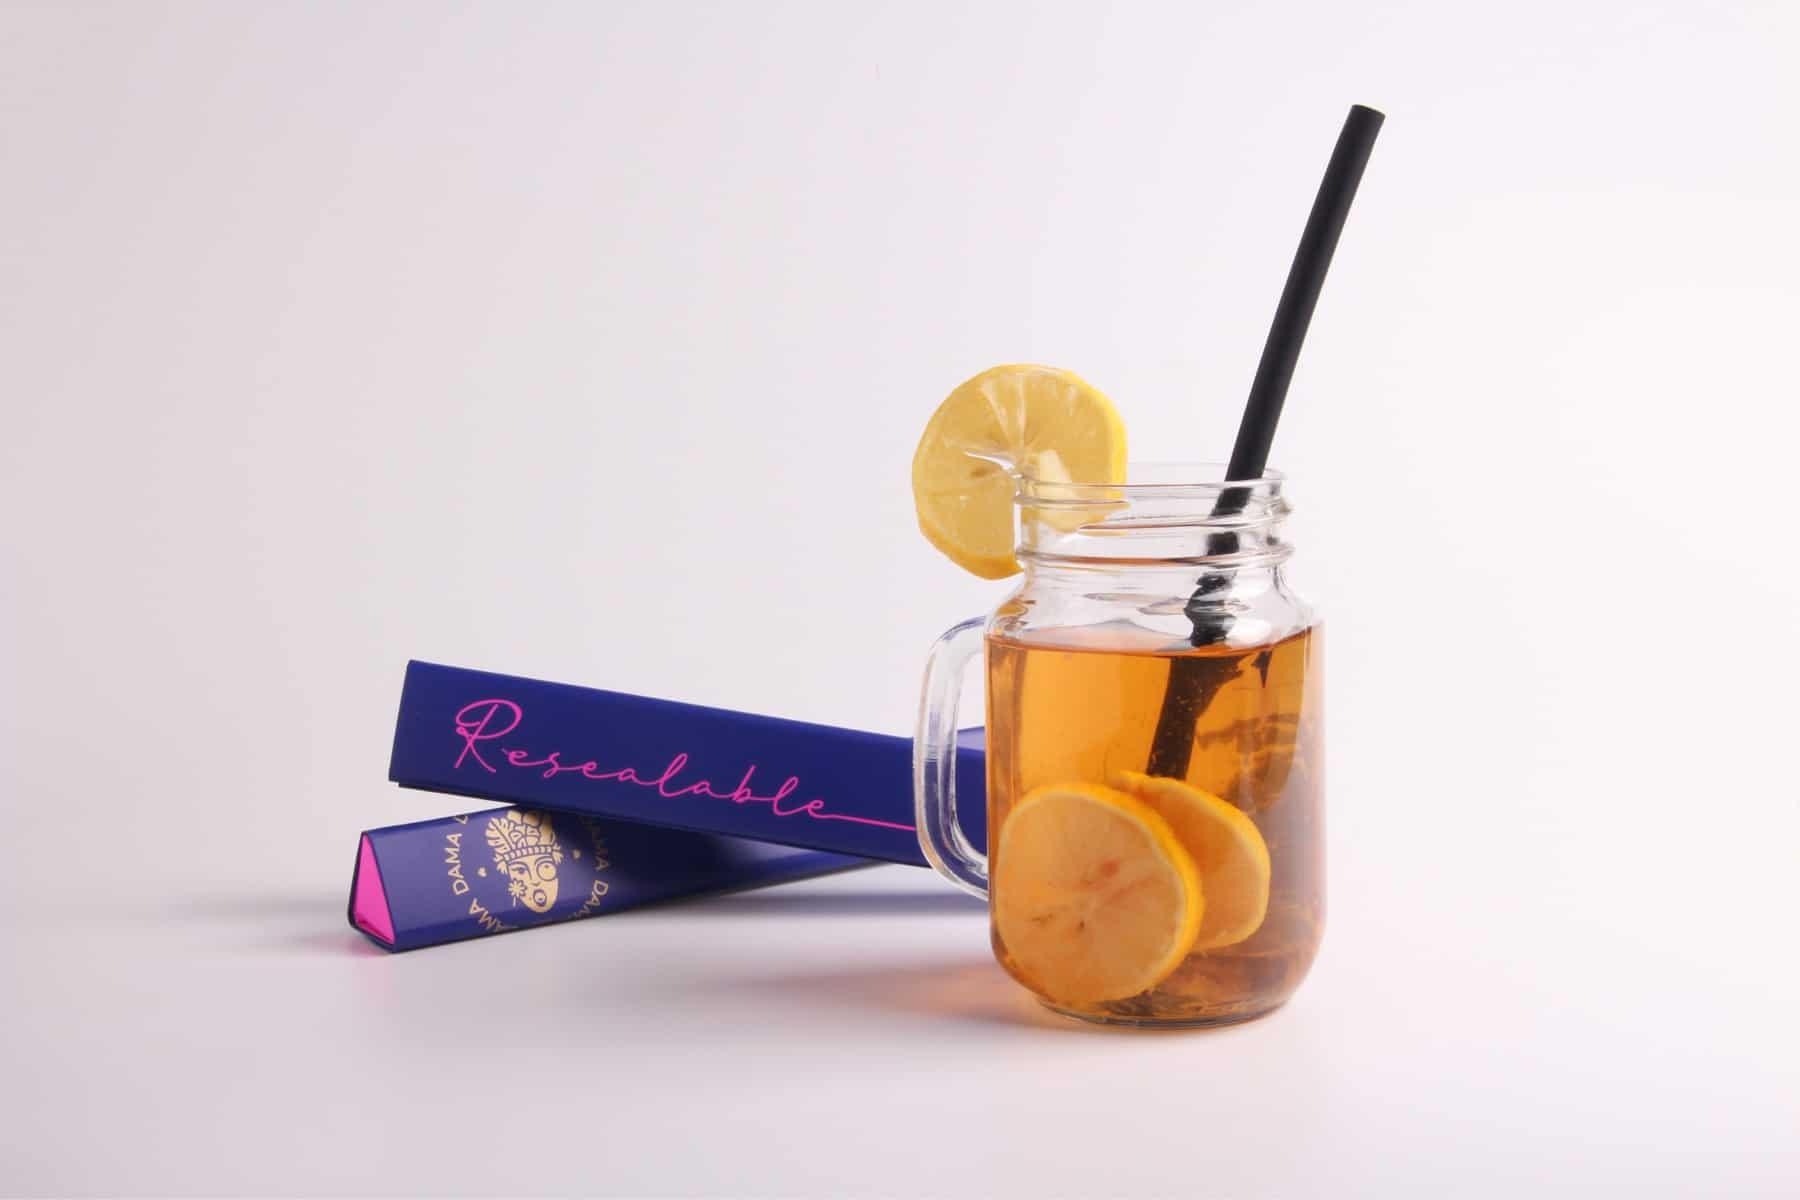 DAMA Resealable Silicone Straw